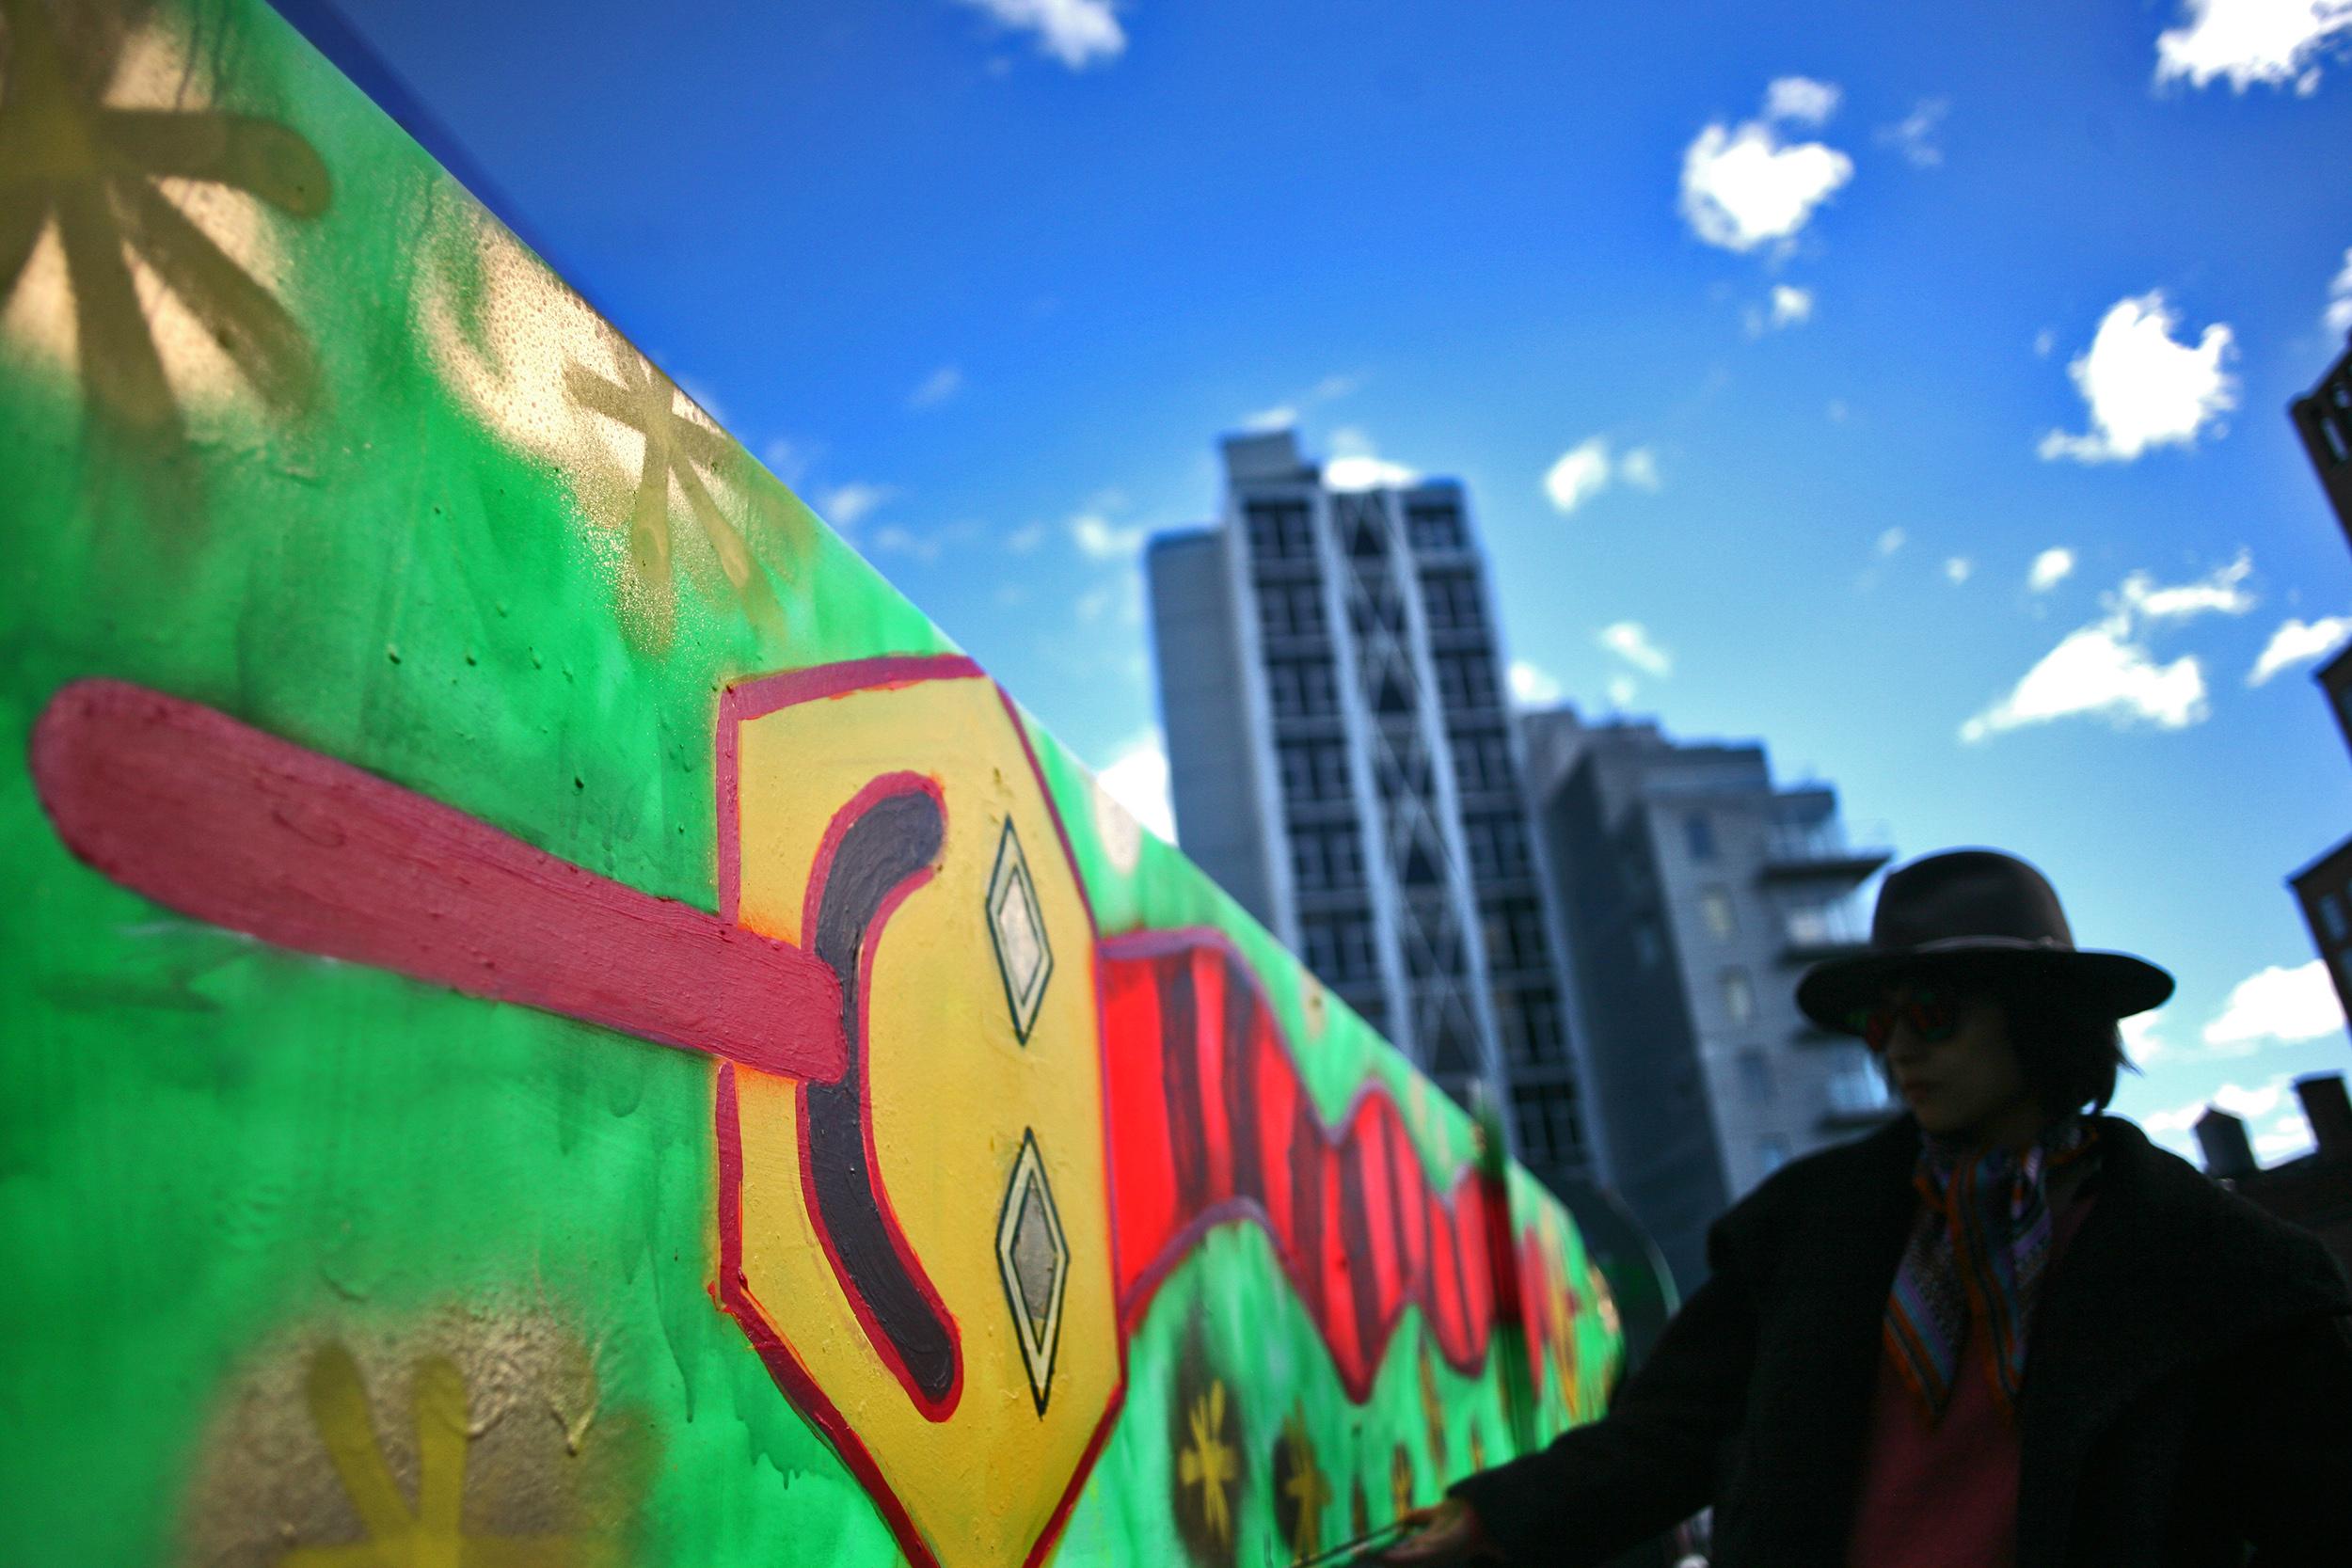 Cecilia-collantes-streetart-kulebra7.jpg